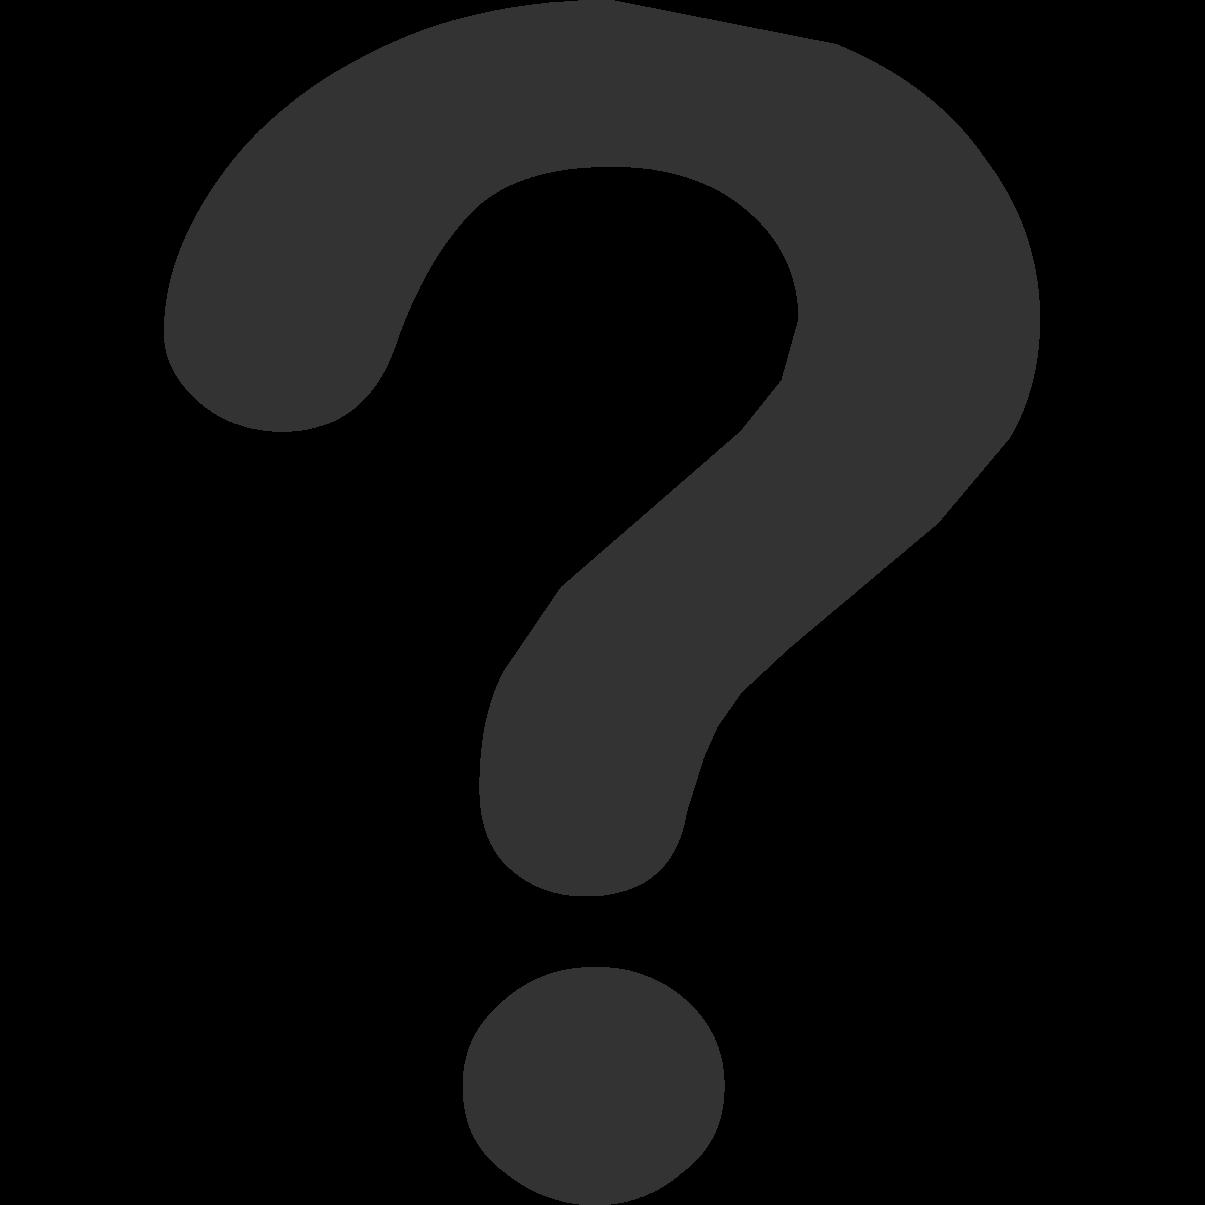 Cute Question Mark Clipart - Clipart Suggest